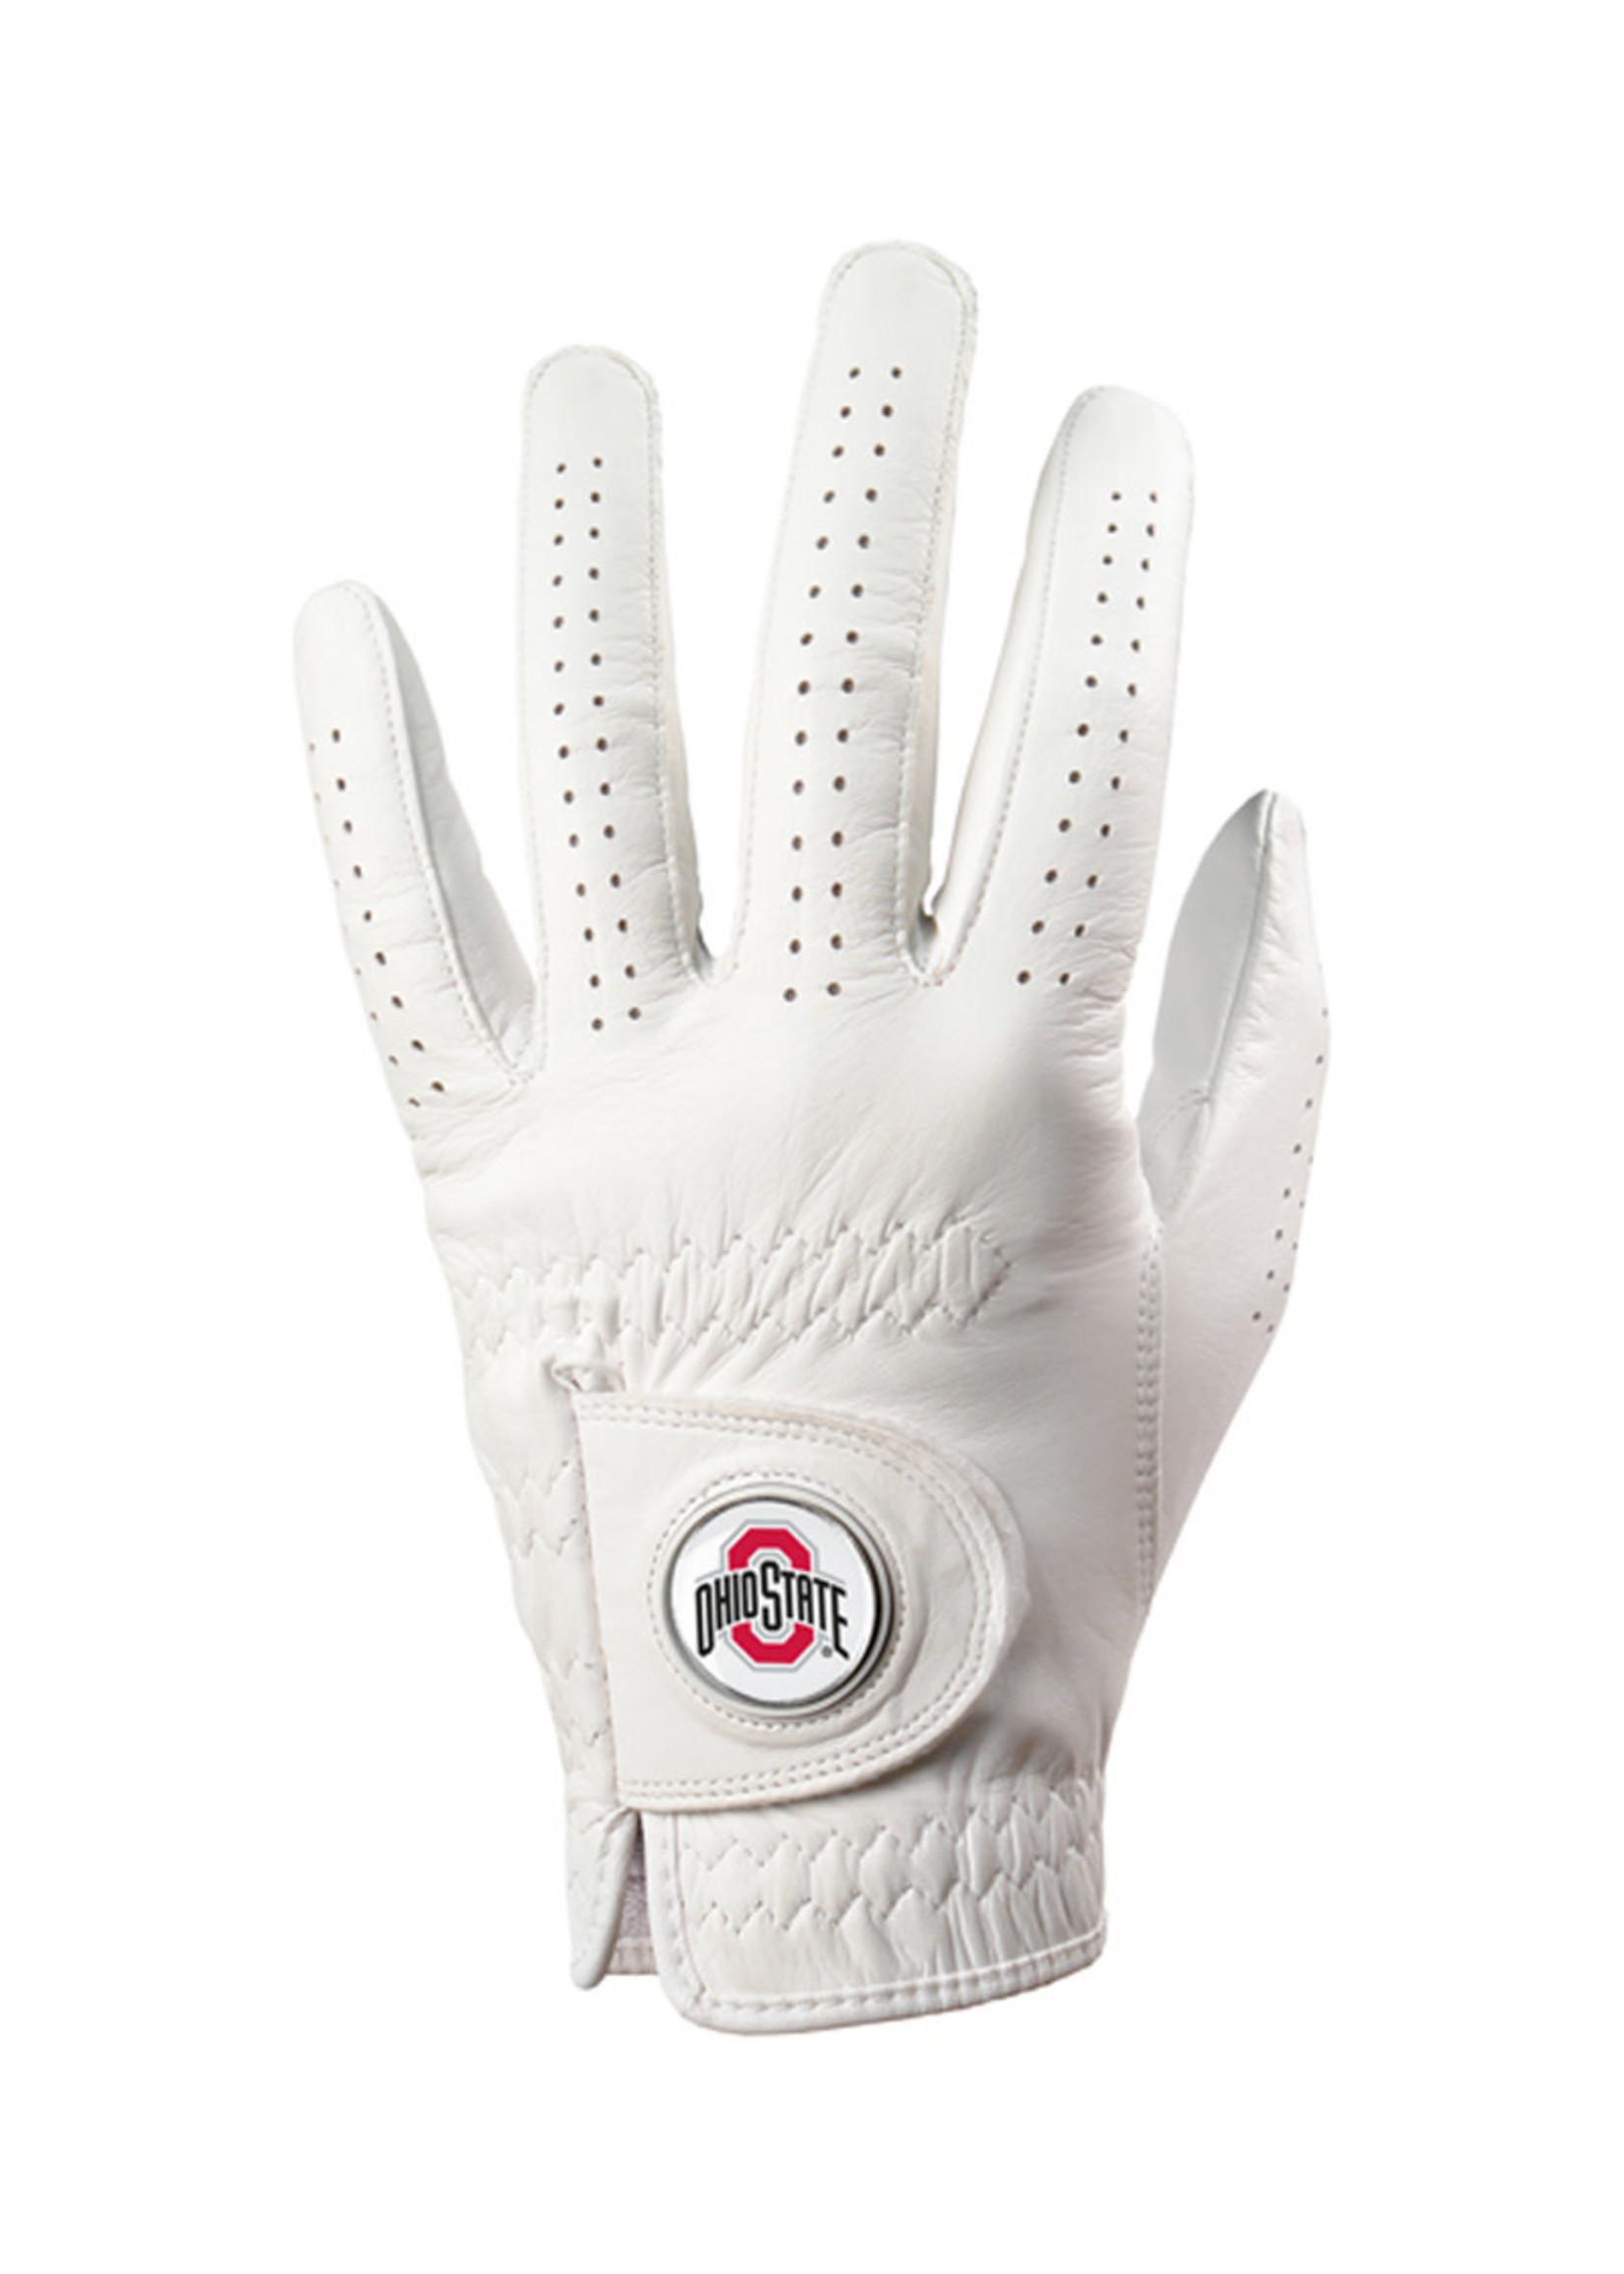 Ohio State Buckeyes Golf Glove with Ball Marker - Medium